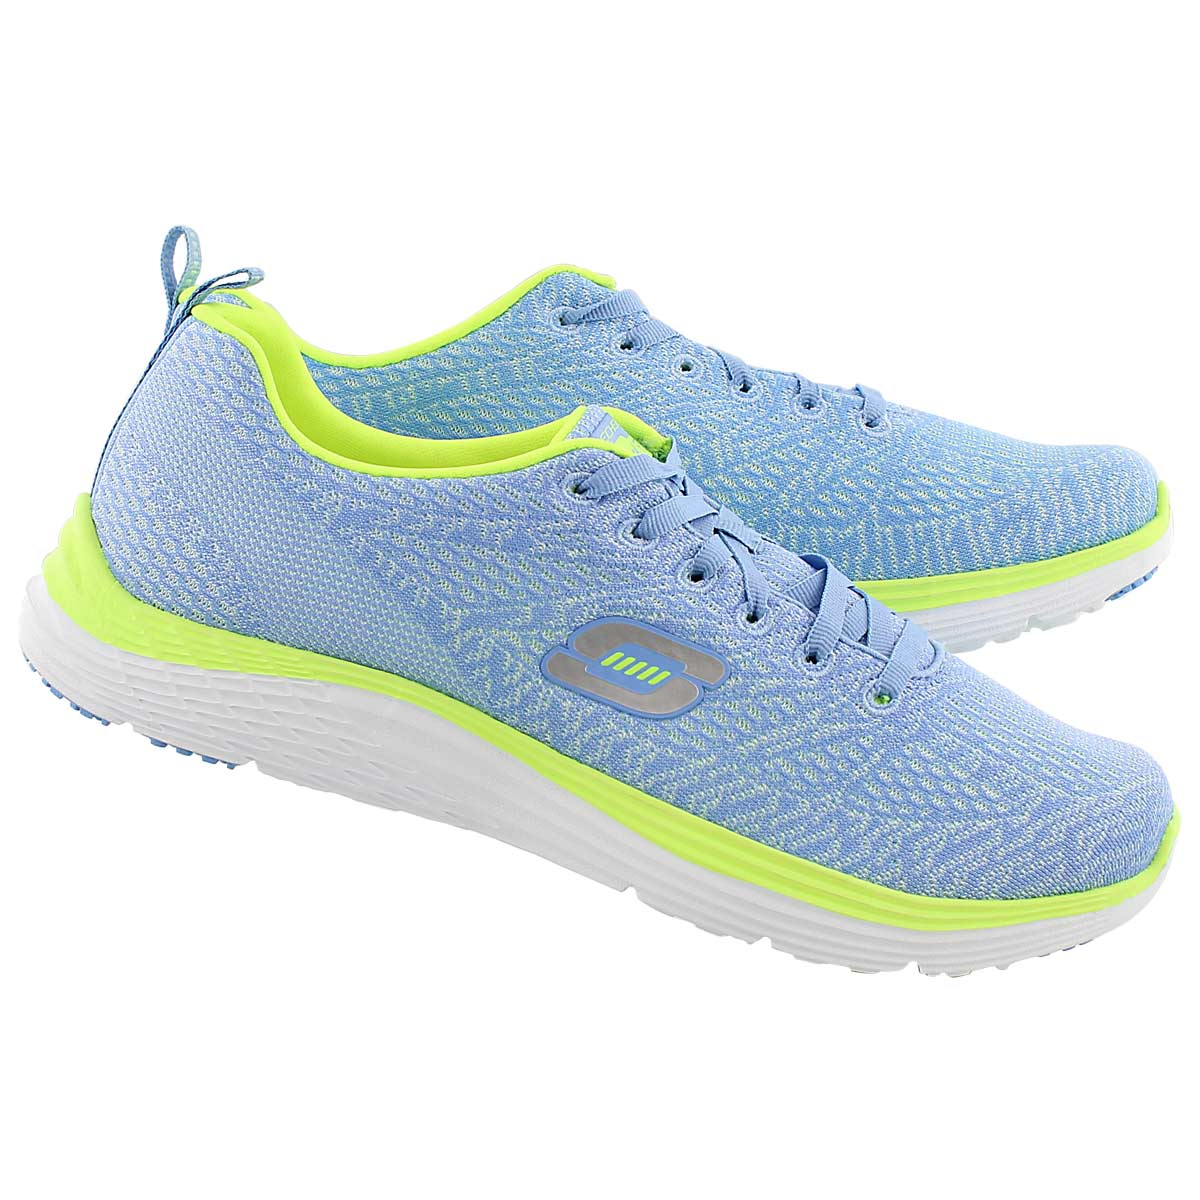 Lds Valeris lt blu/yello lace up sneaker